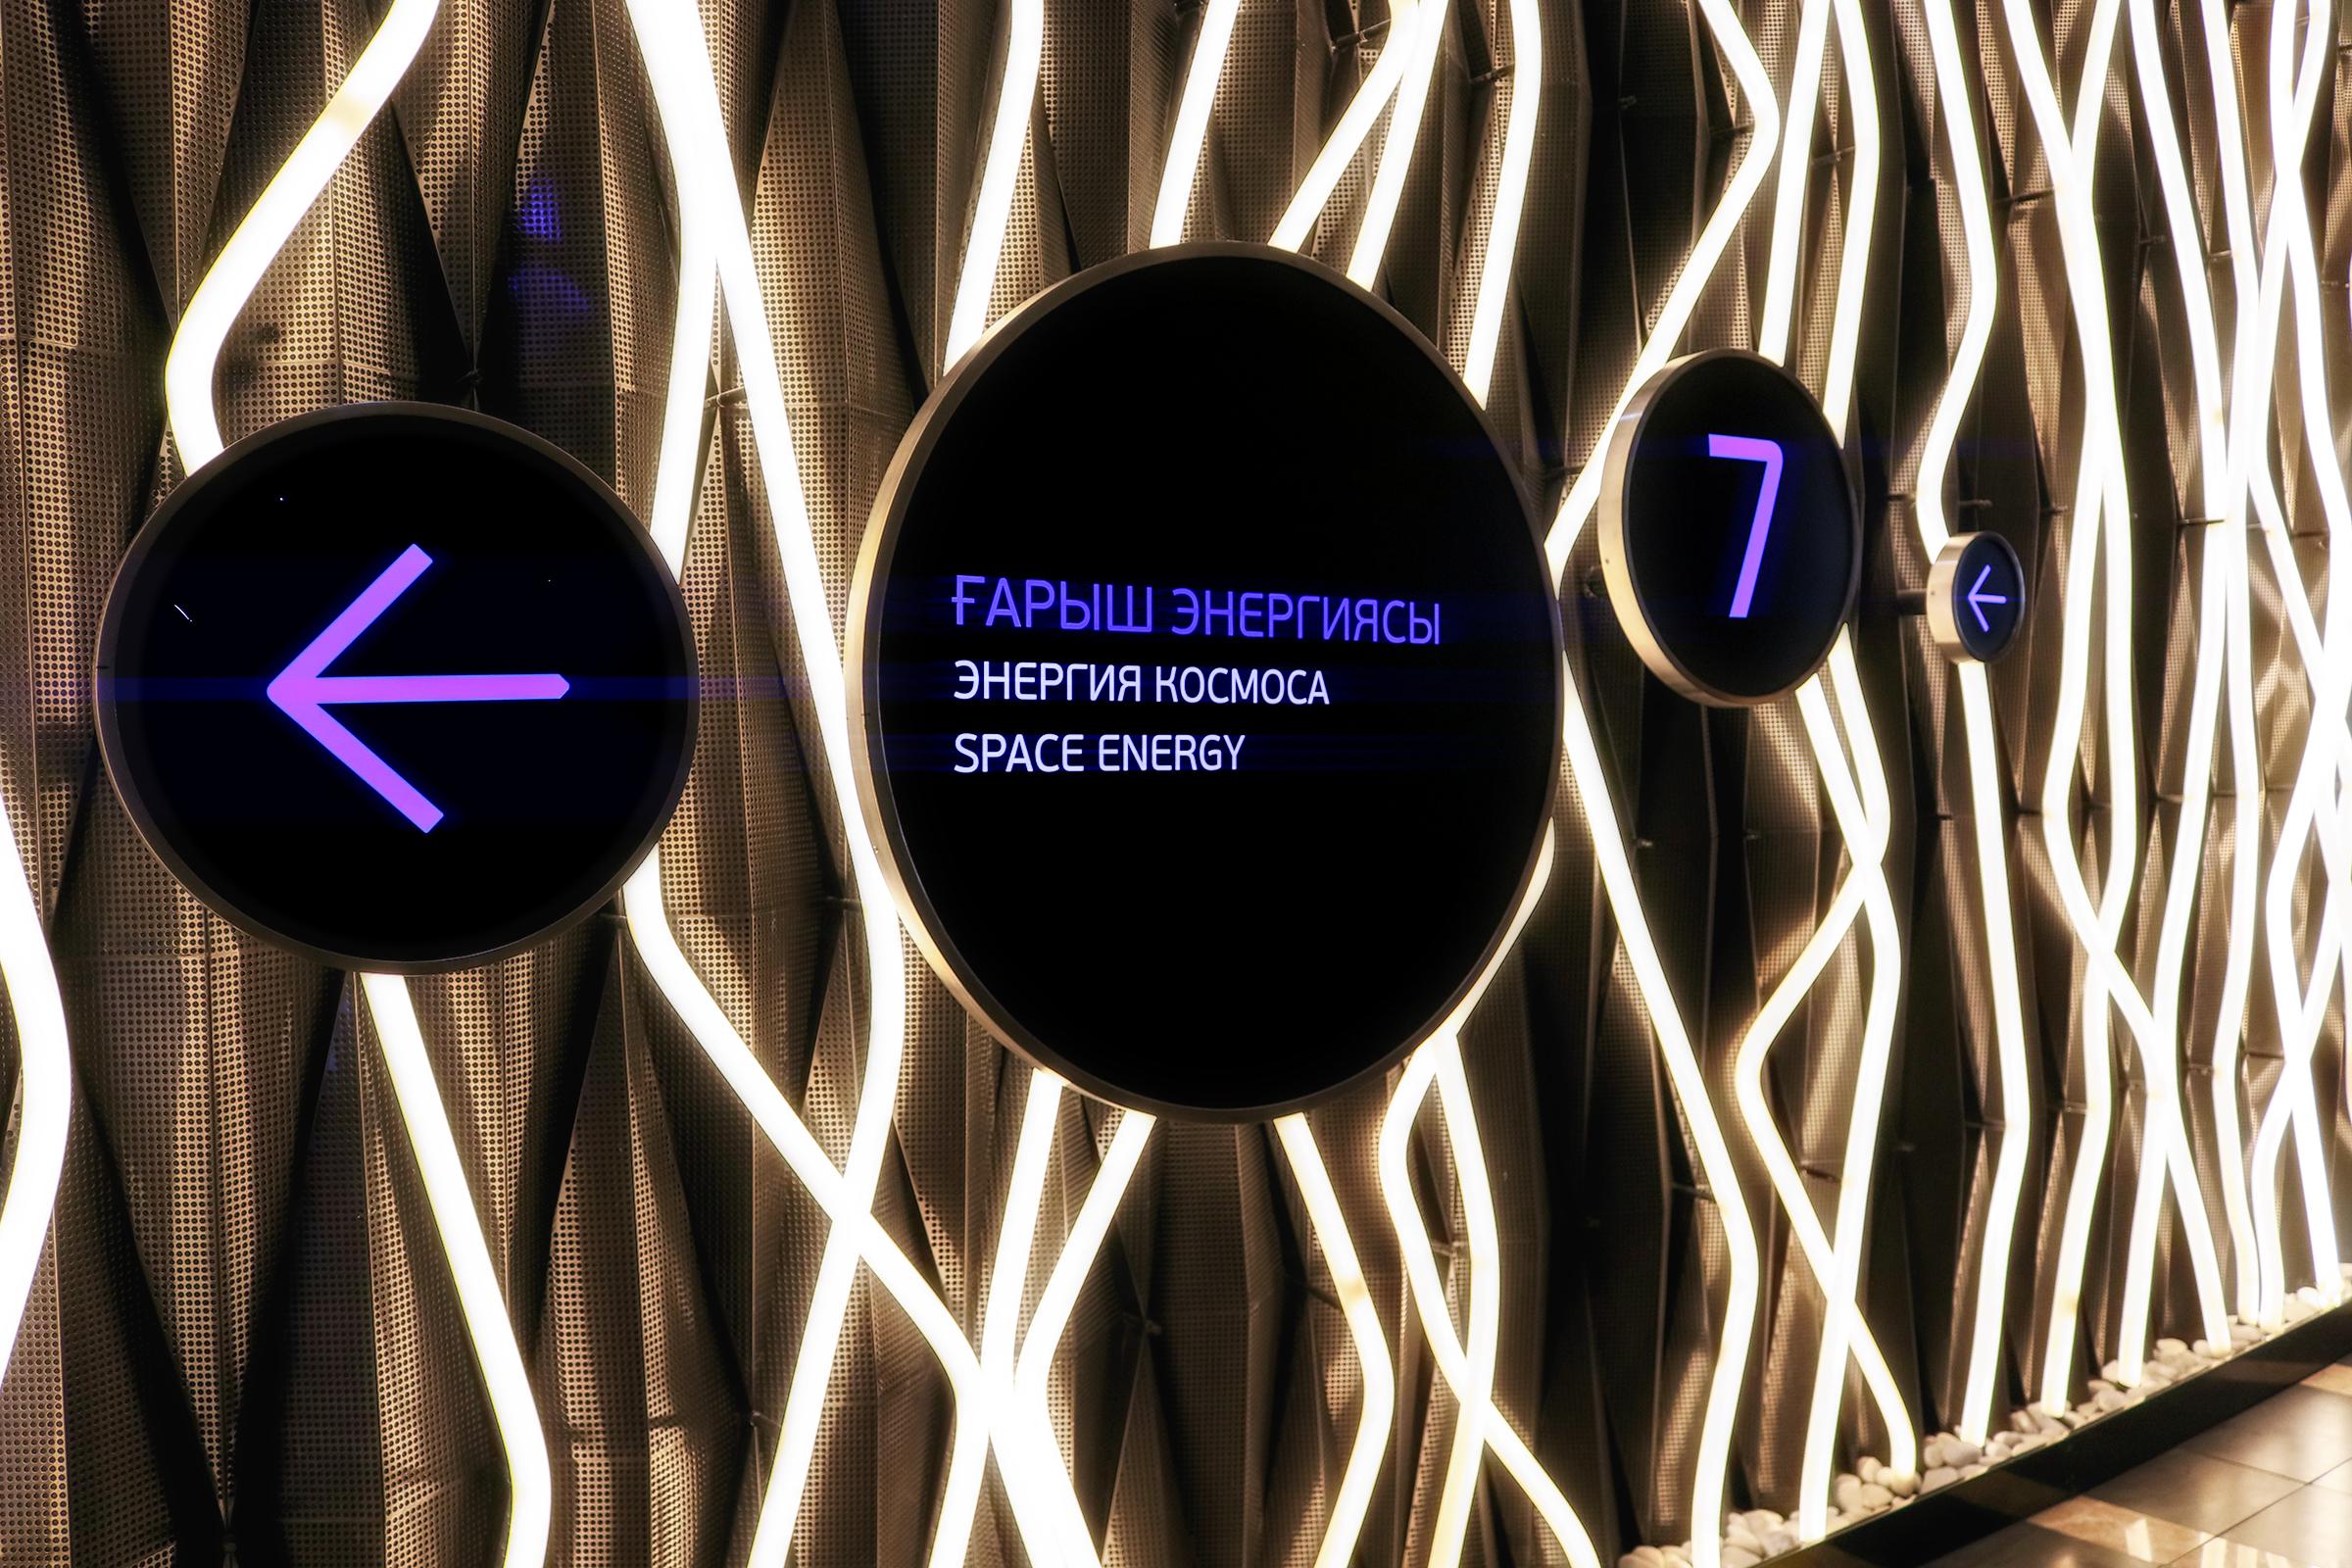 Astana_Sphere_discs_3709.jpg